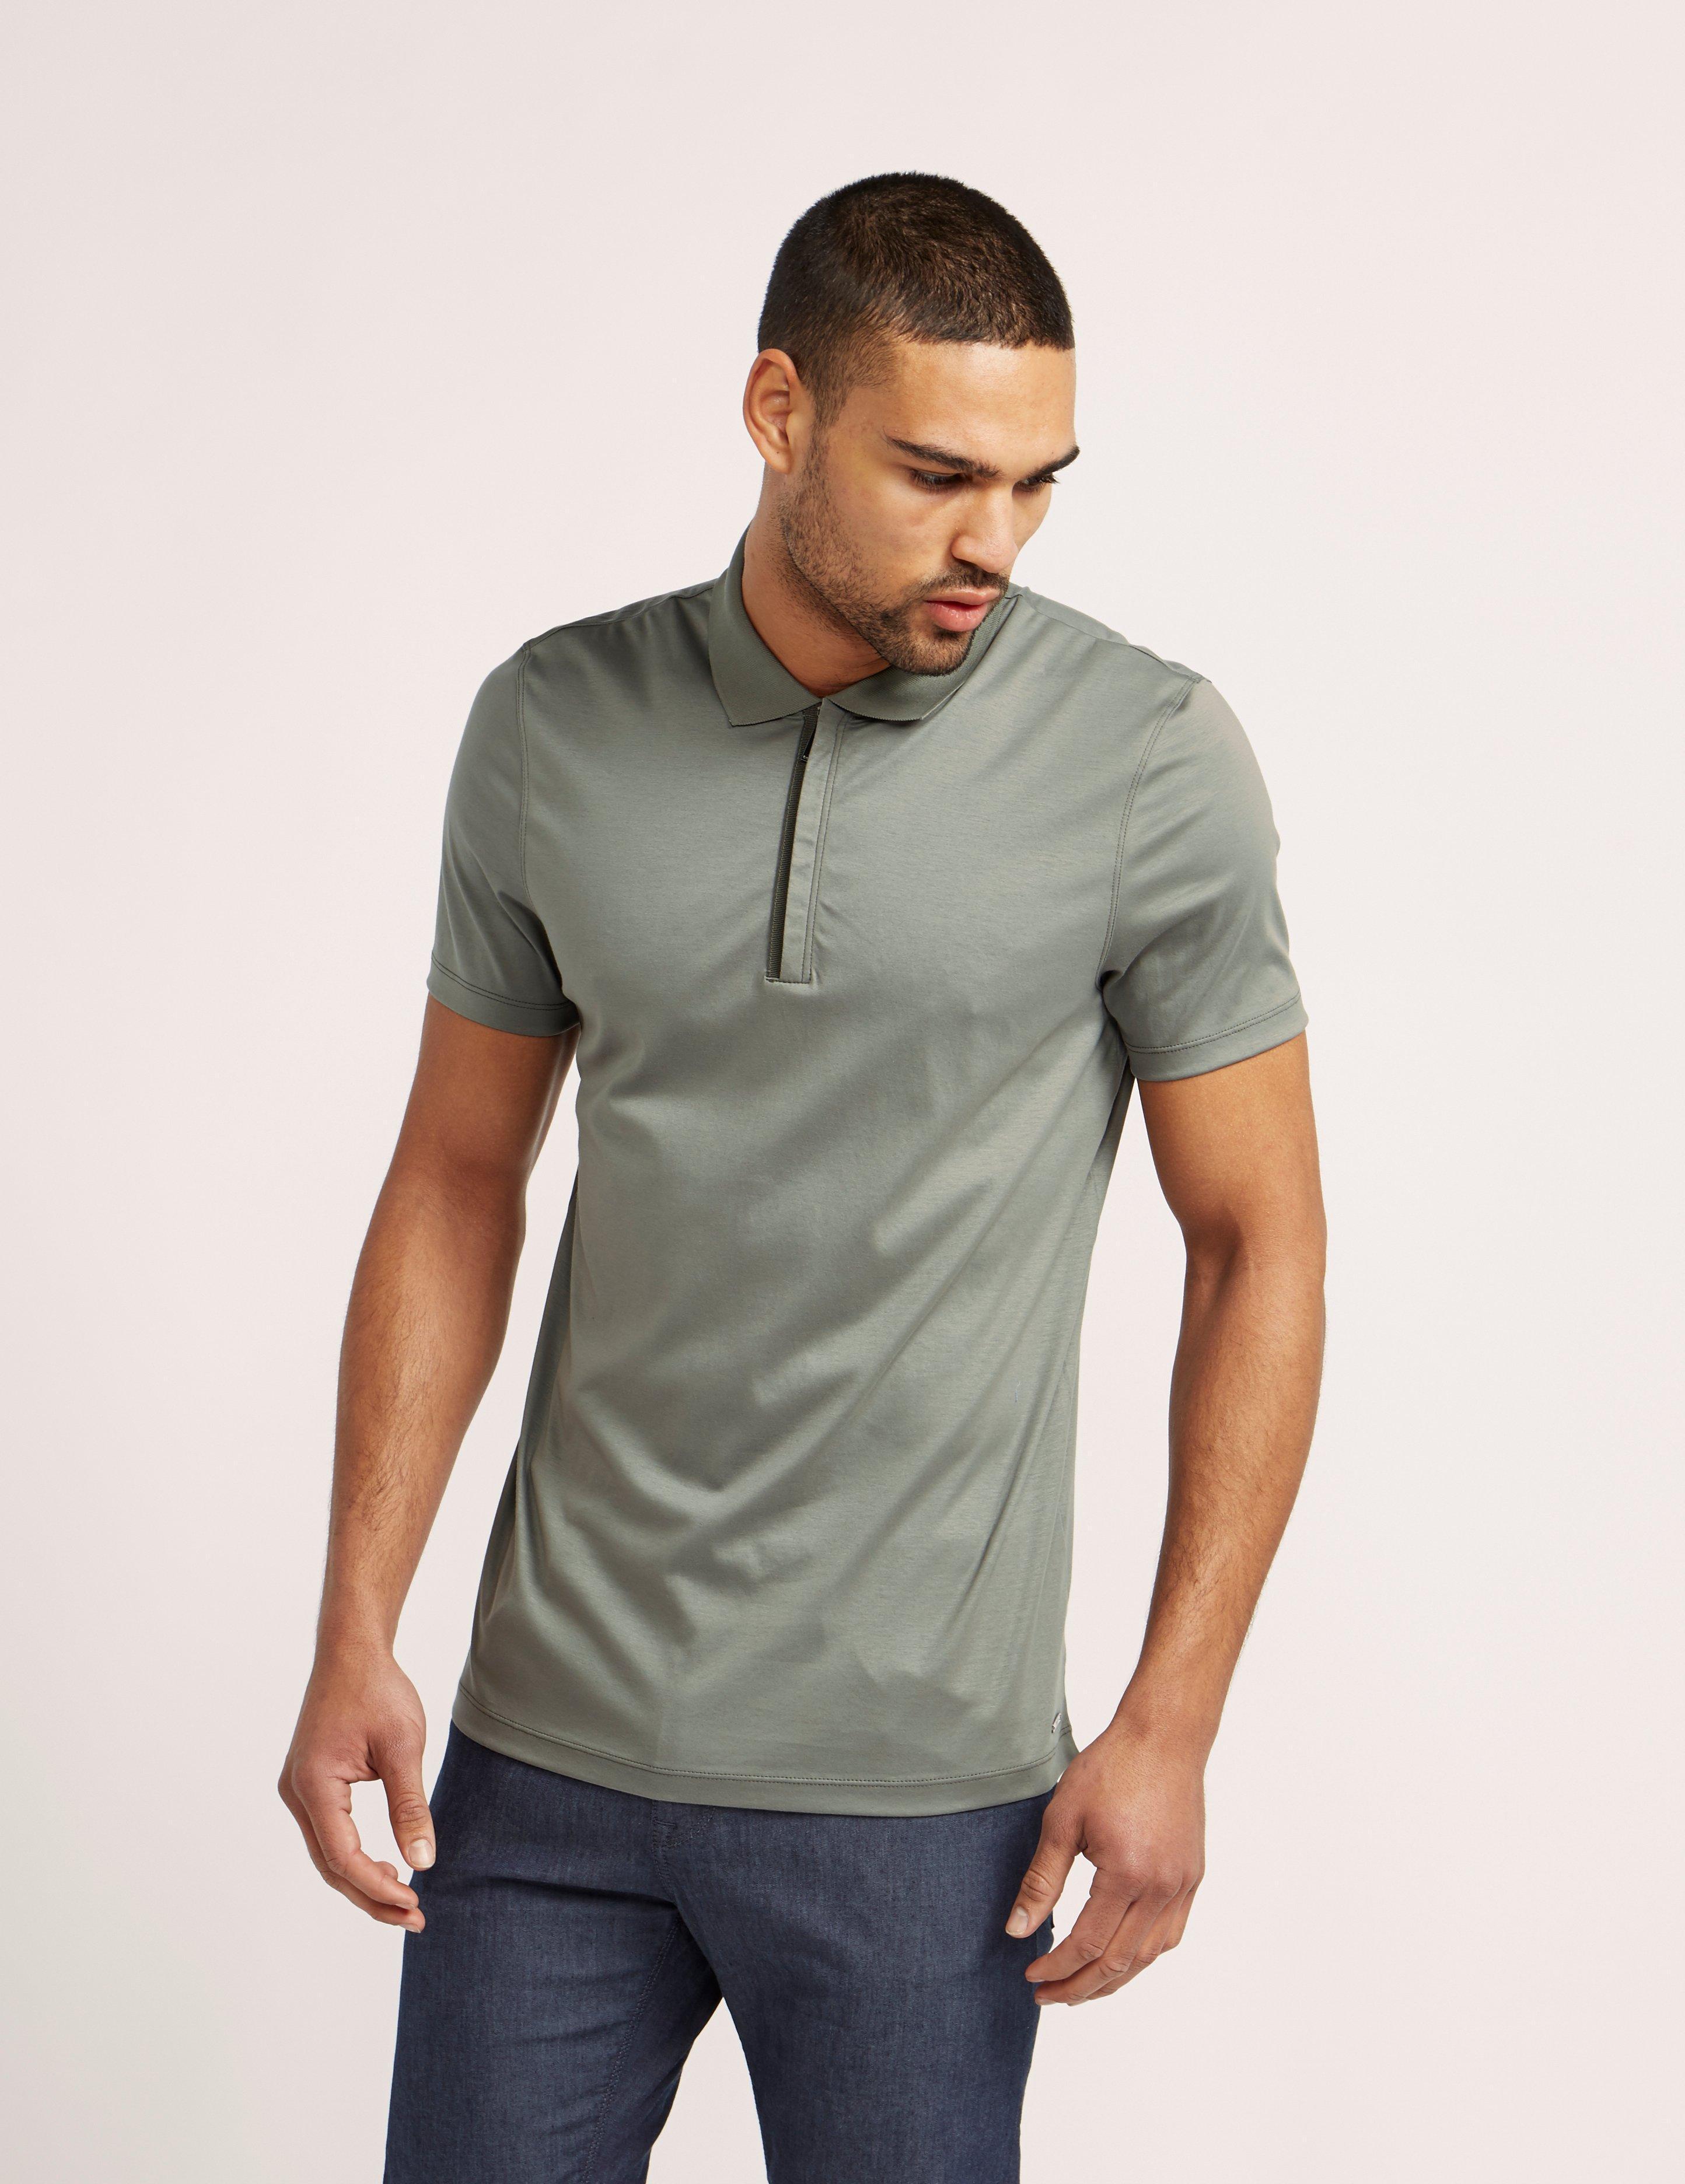 Buy Branded Polo T Shirts Online Rldm